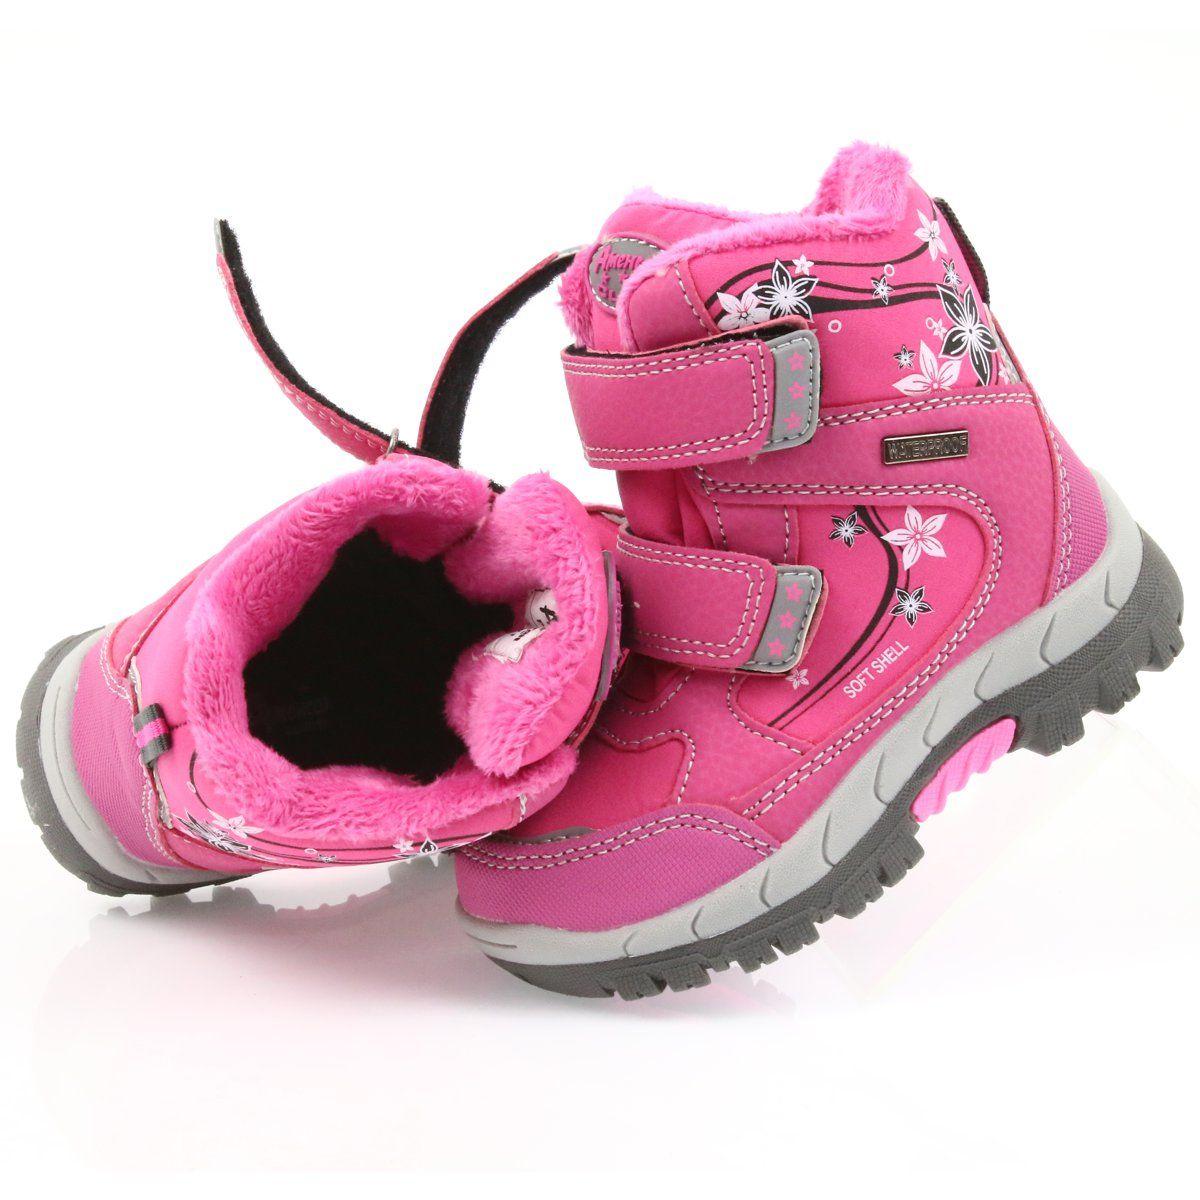 American Club American Buty Zimowe Z Membrana 3121 Rozowe Shoes Baby Shoes Kids